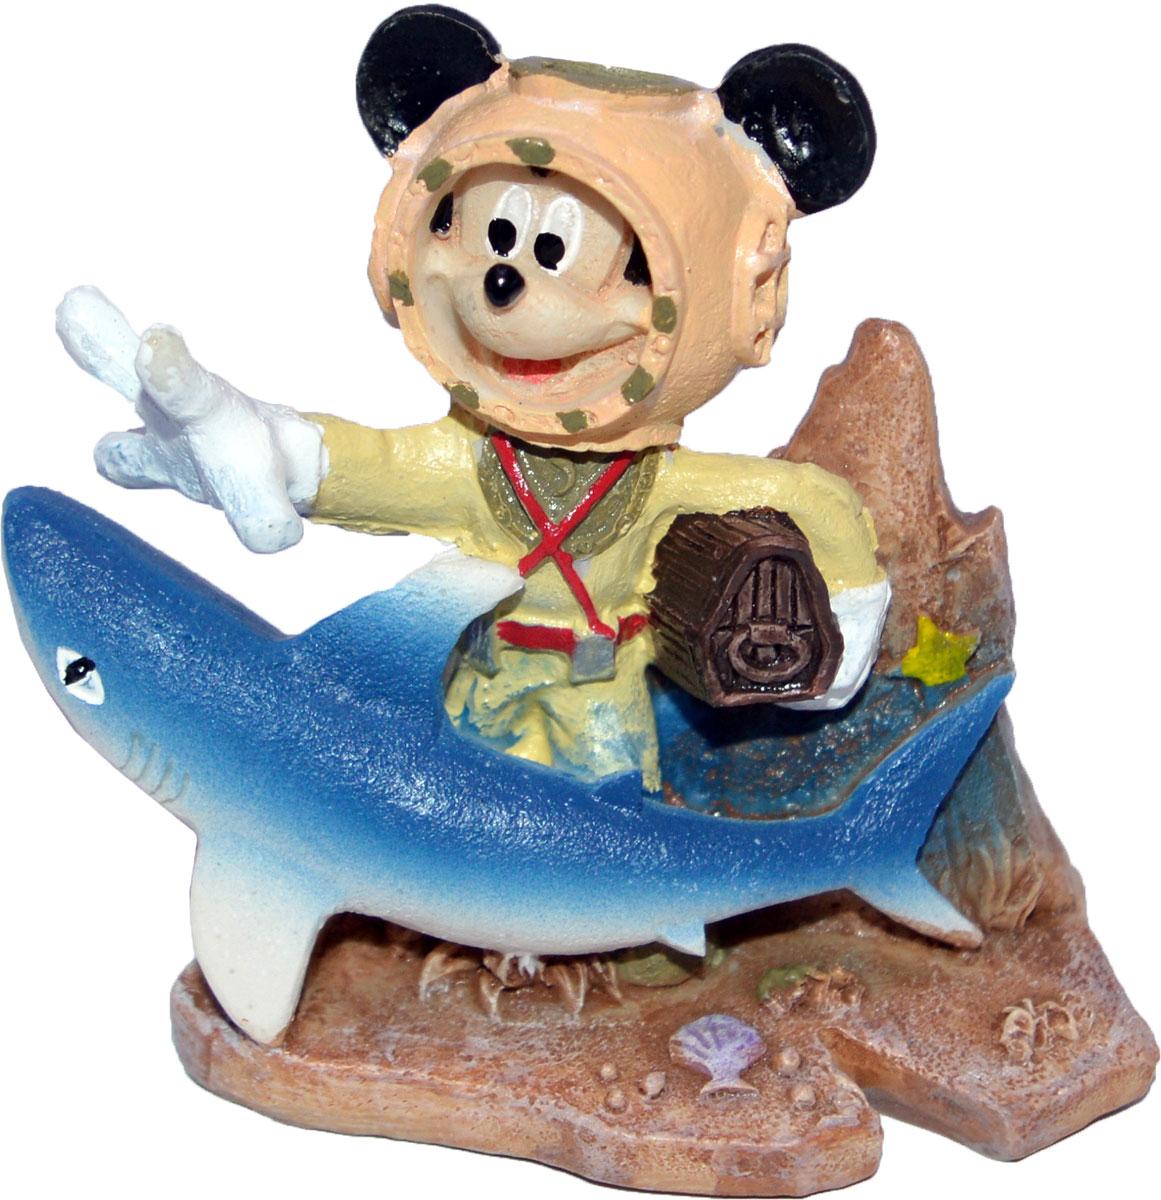 Декорация для аквариума Penn-Plax Микки Маус с сокровищами, 6 х 2,5 х 5,1 см декорация для аквариума penn plax племя тики 15 см